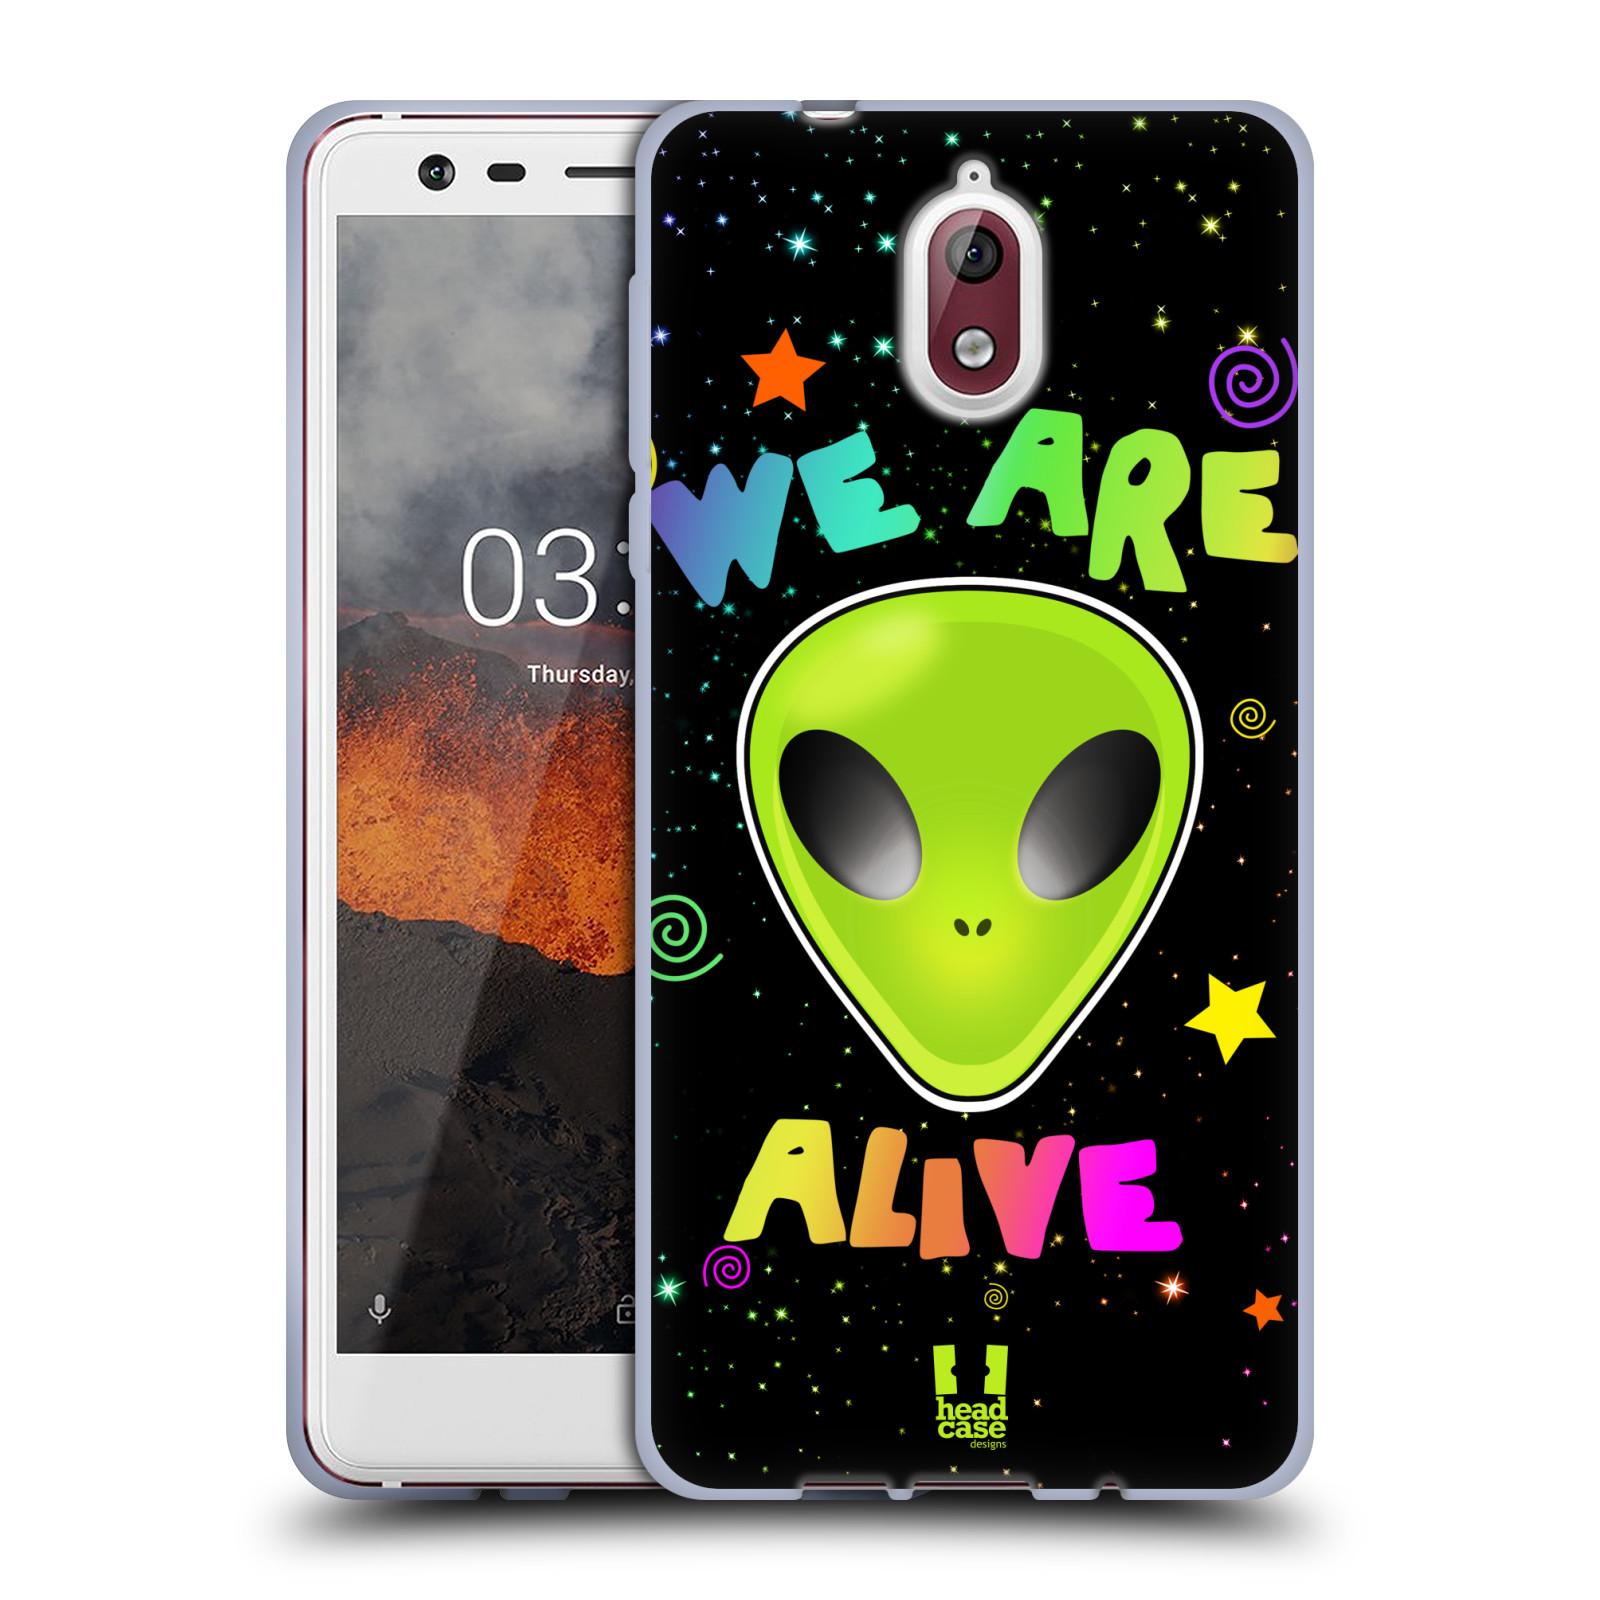 Silikonové pouzdro na mobil Nokia 3.1 - Head Case - ALIENS ALIVE